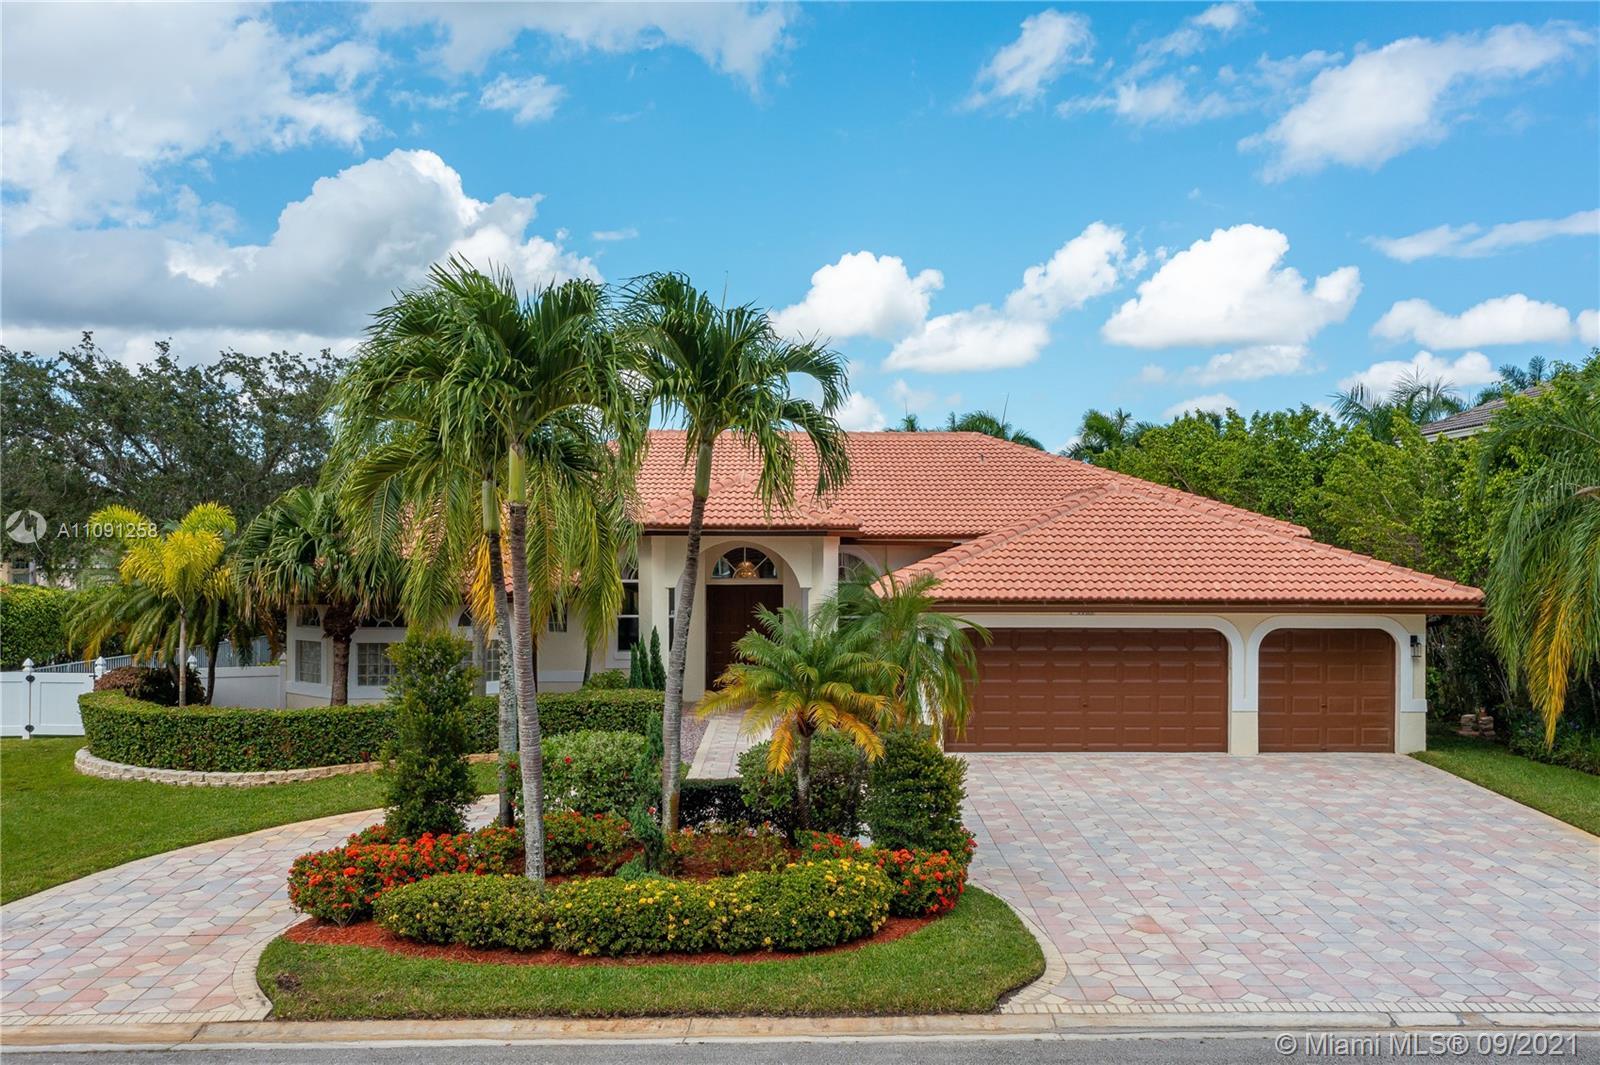 1189 118th Way, Coral Springs, Florida 33071